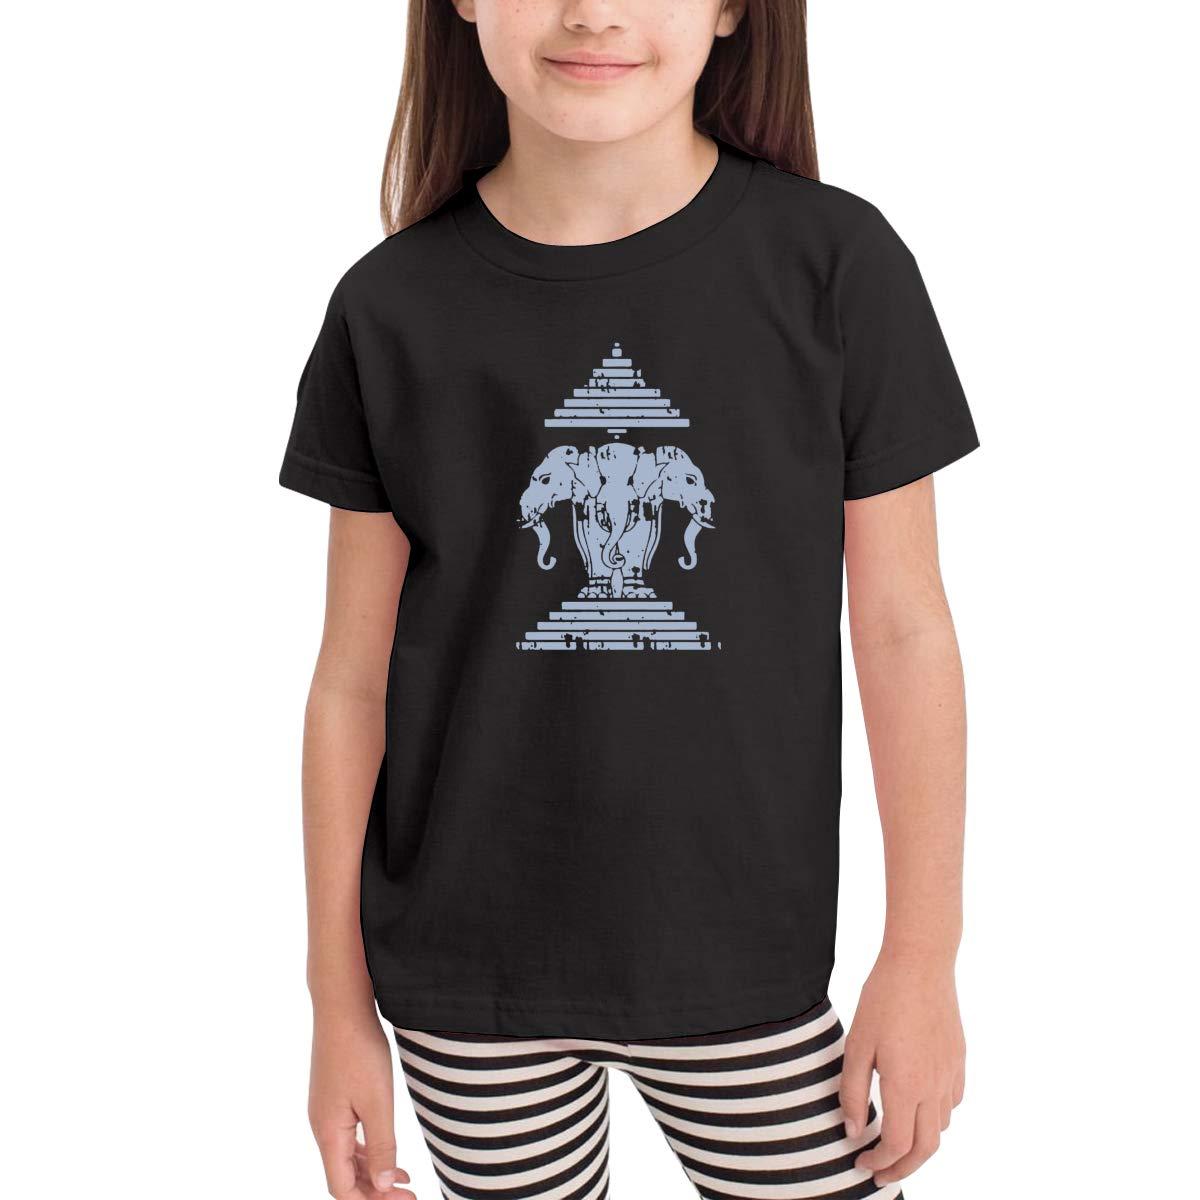 Erawan Lao Laos Flag Unisex Youths Short Sleeve T-Shirt Kids T-Shirt Tops Black